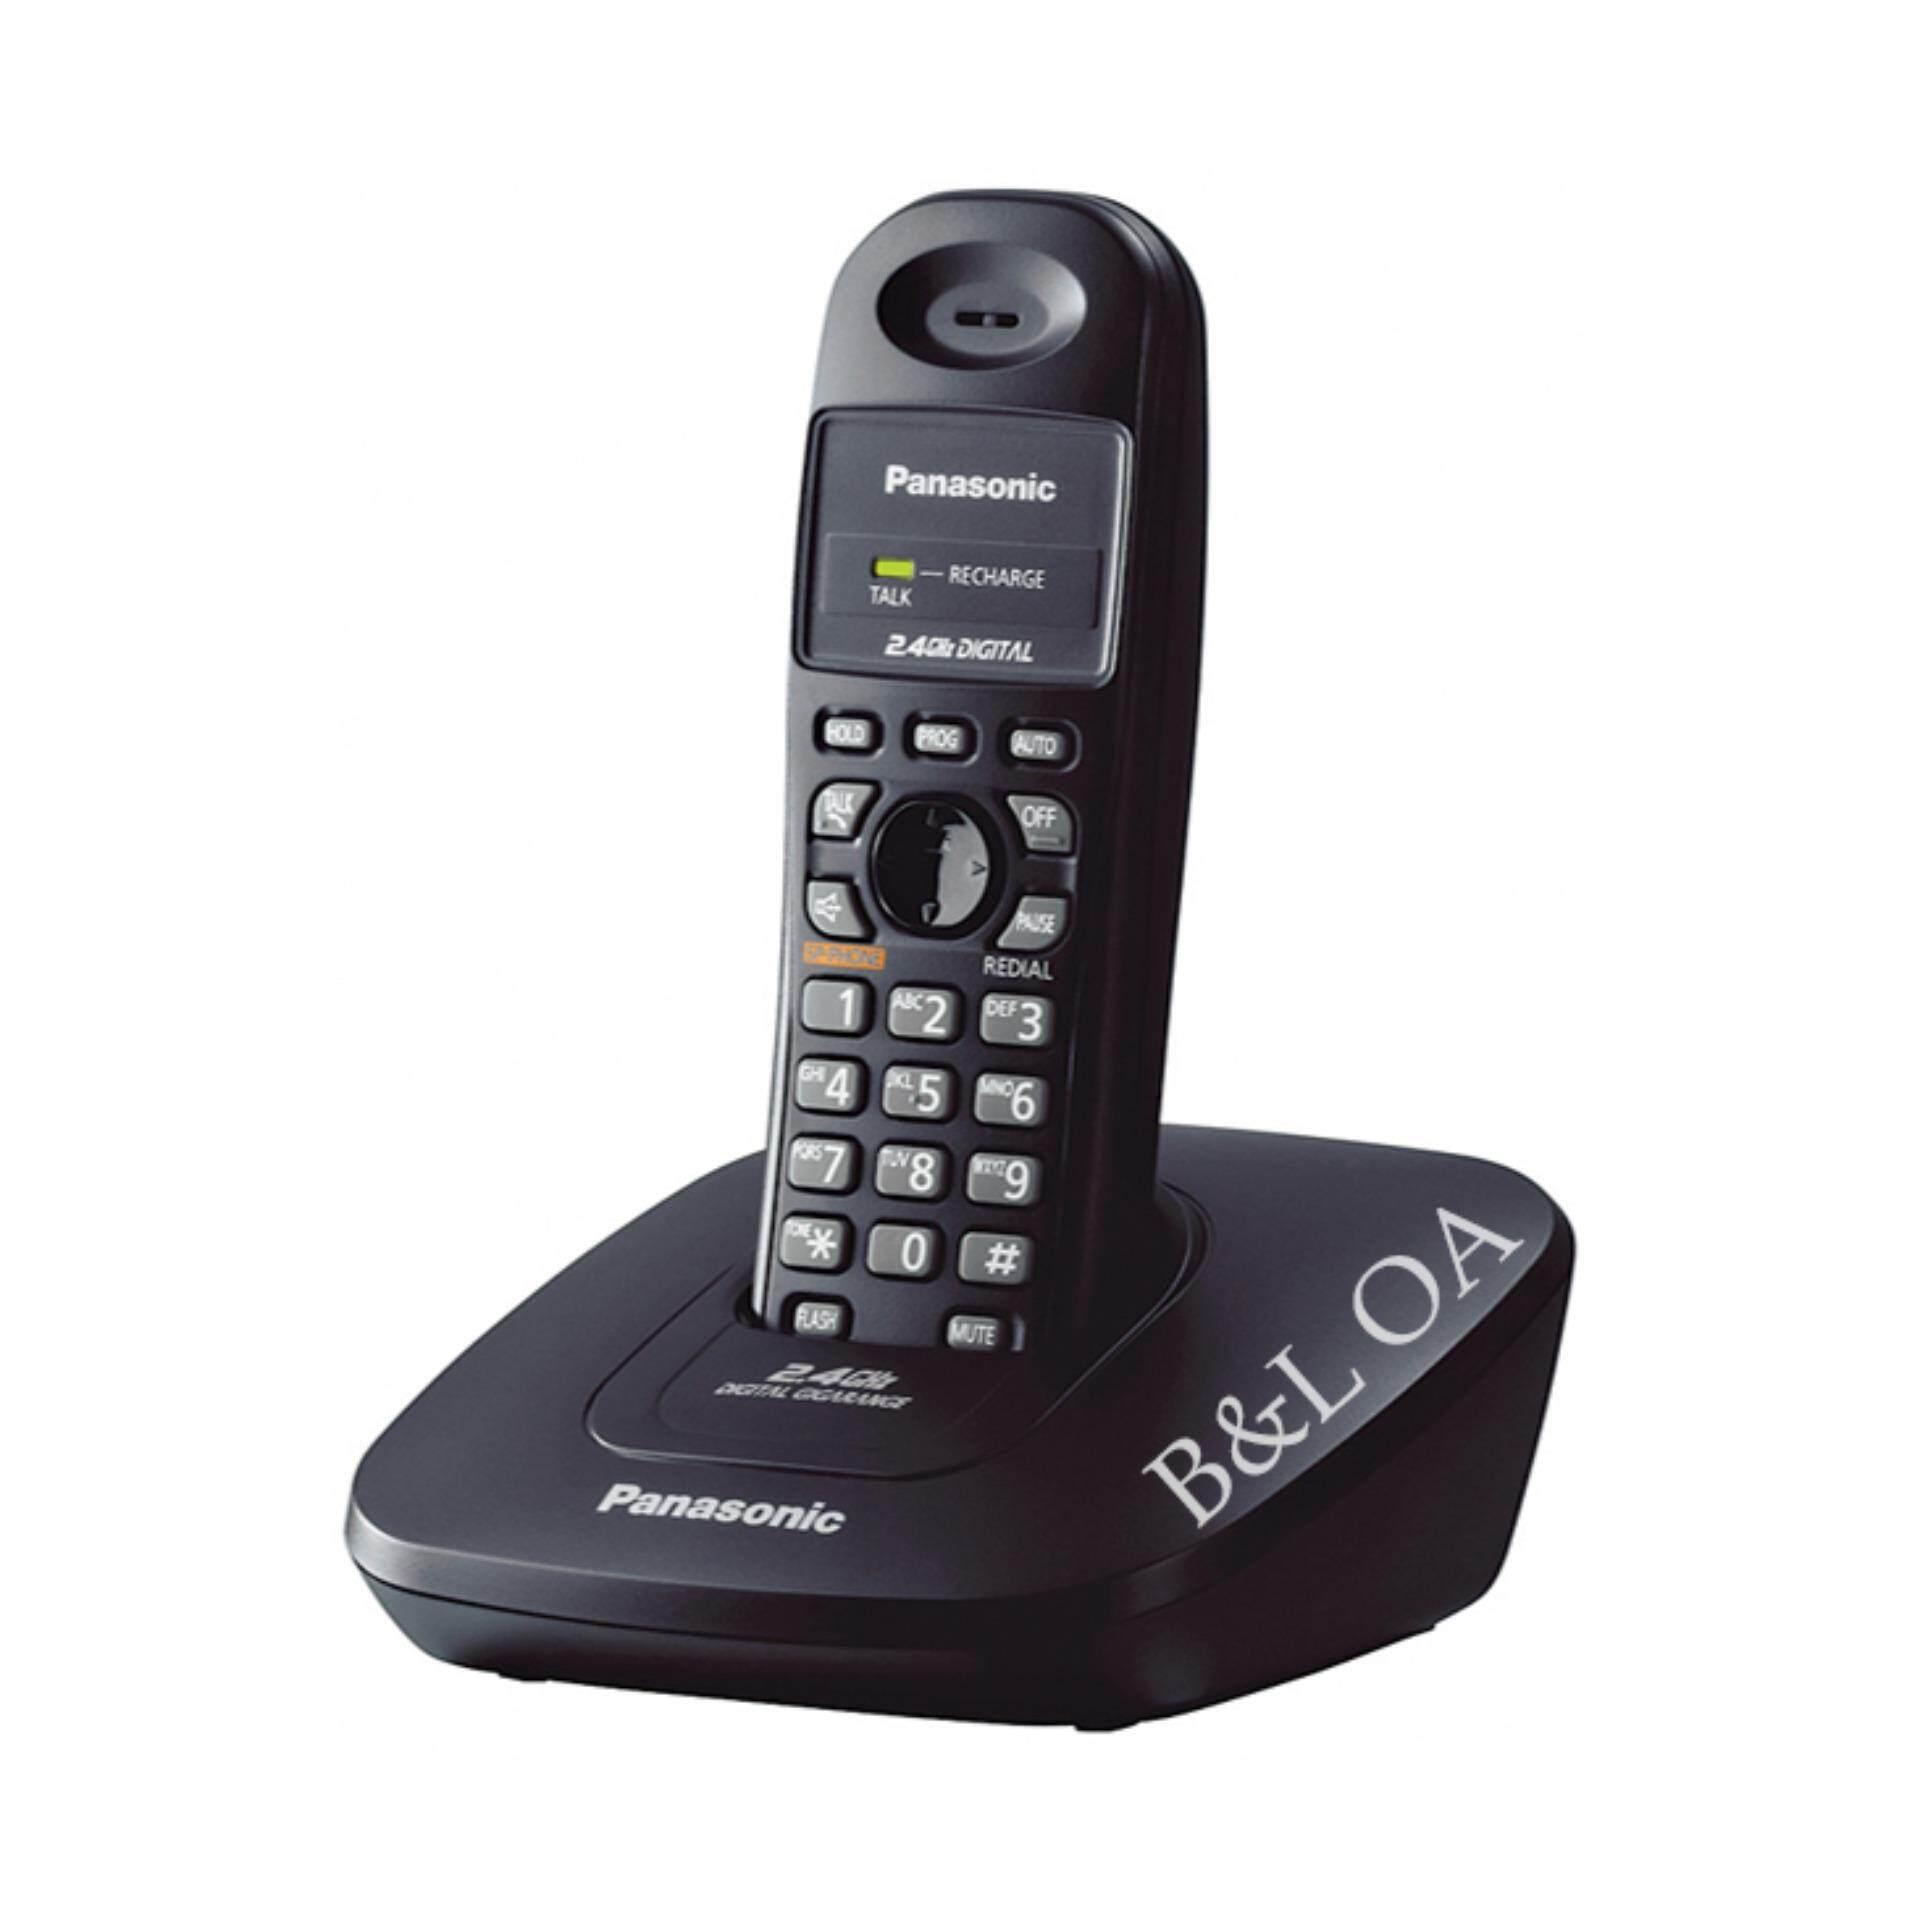 Panasonic Cordless Phone รุ่น Kx-Tg3600bxb - Black.